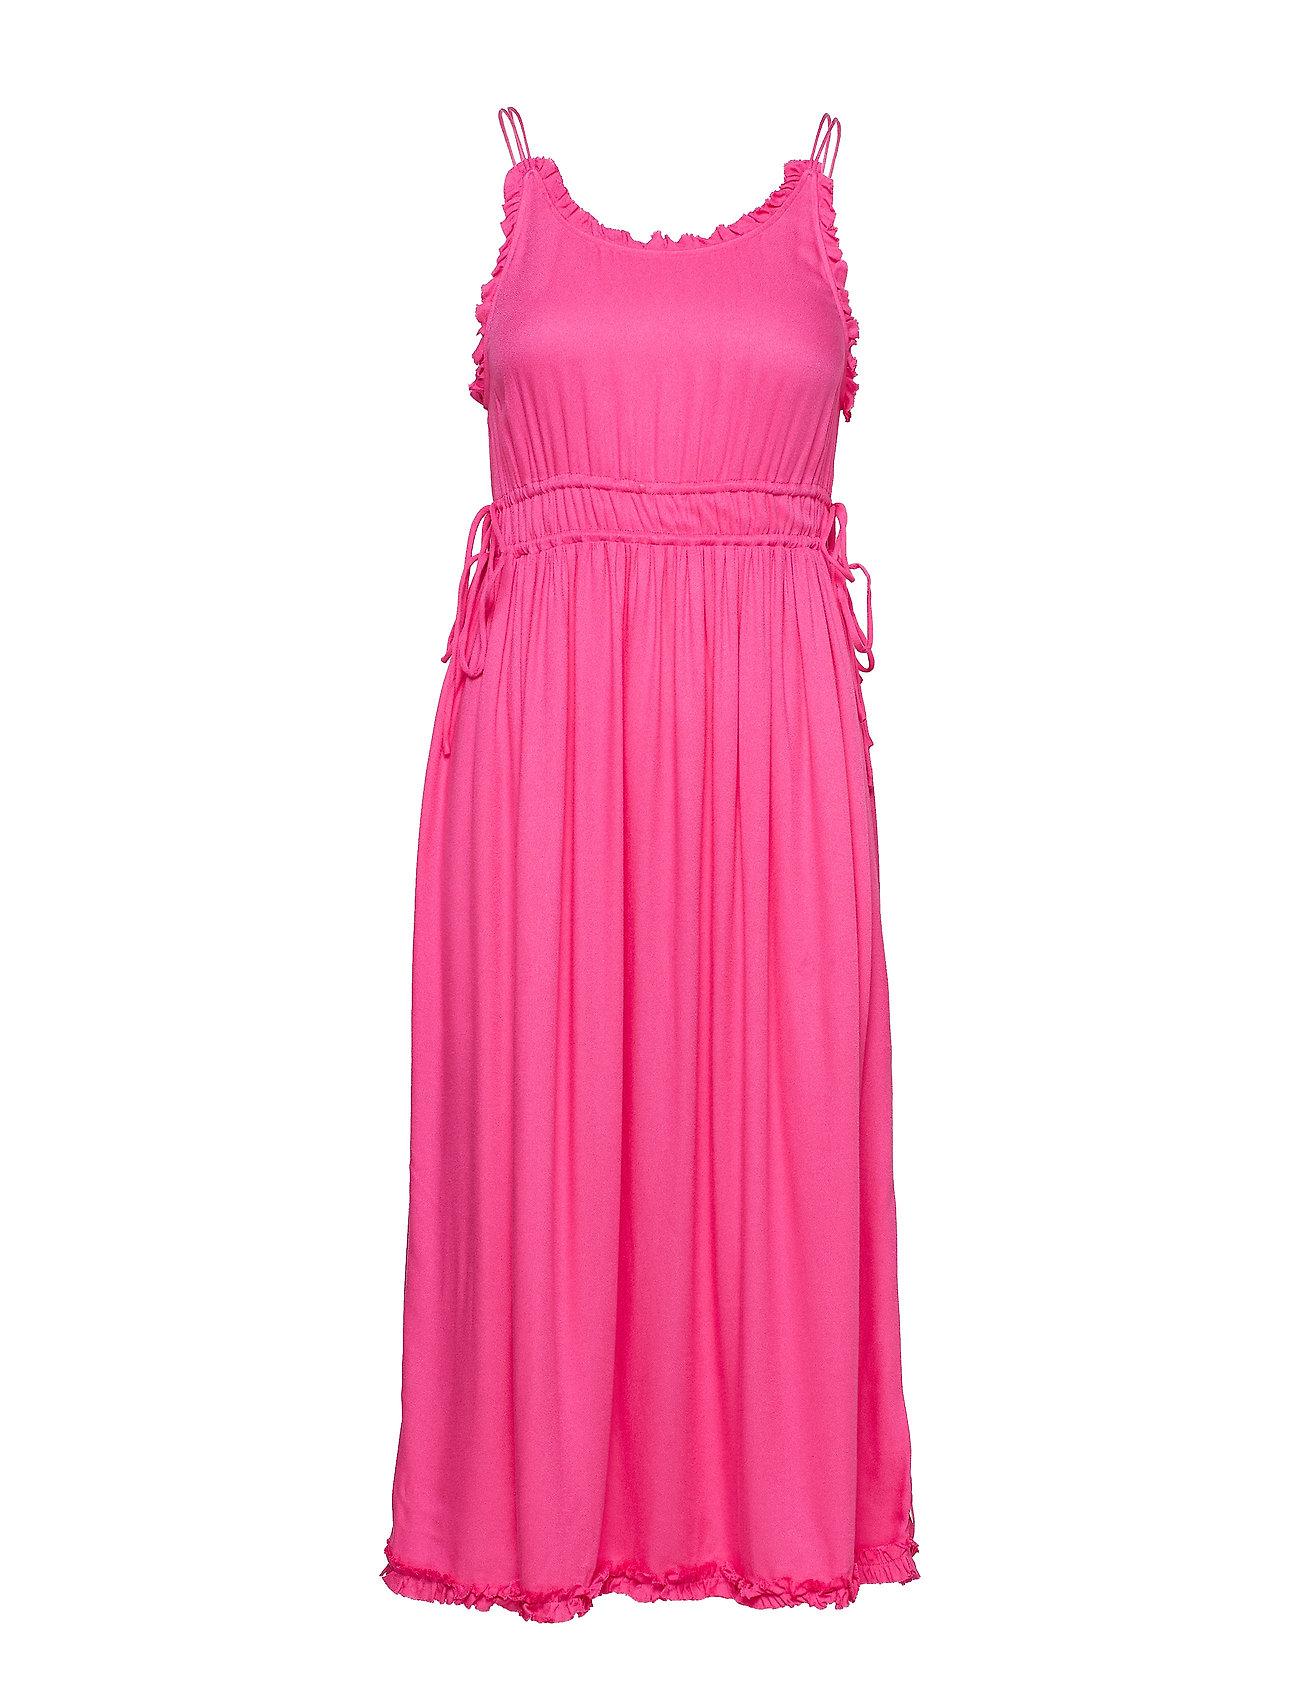 Scotch & Soda Viscose summer midi dress with straps - CANDY PINK